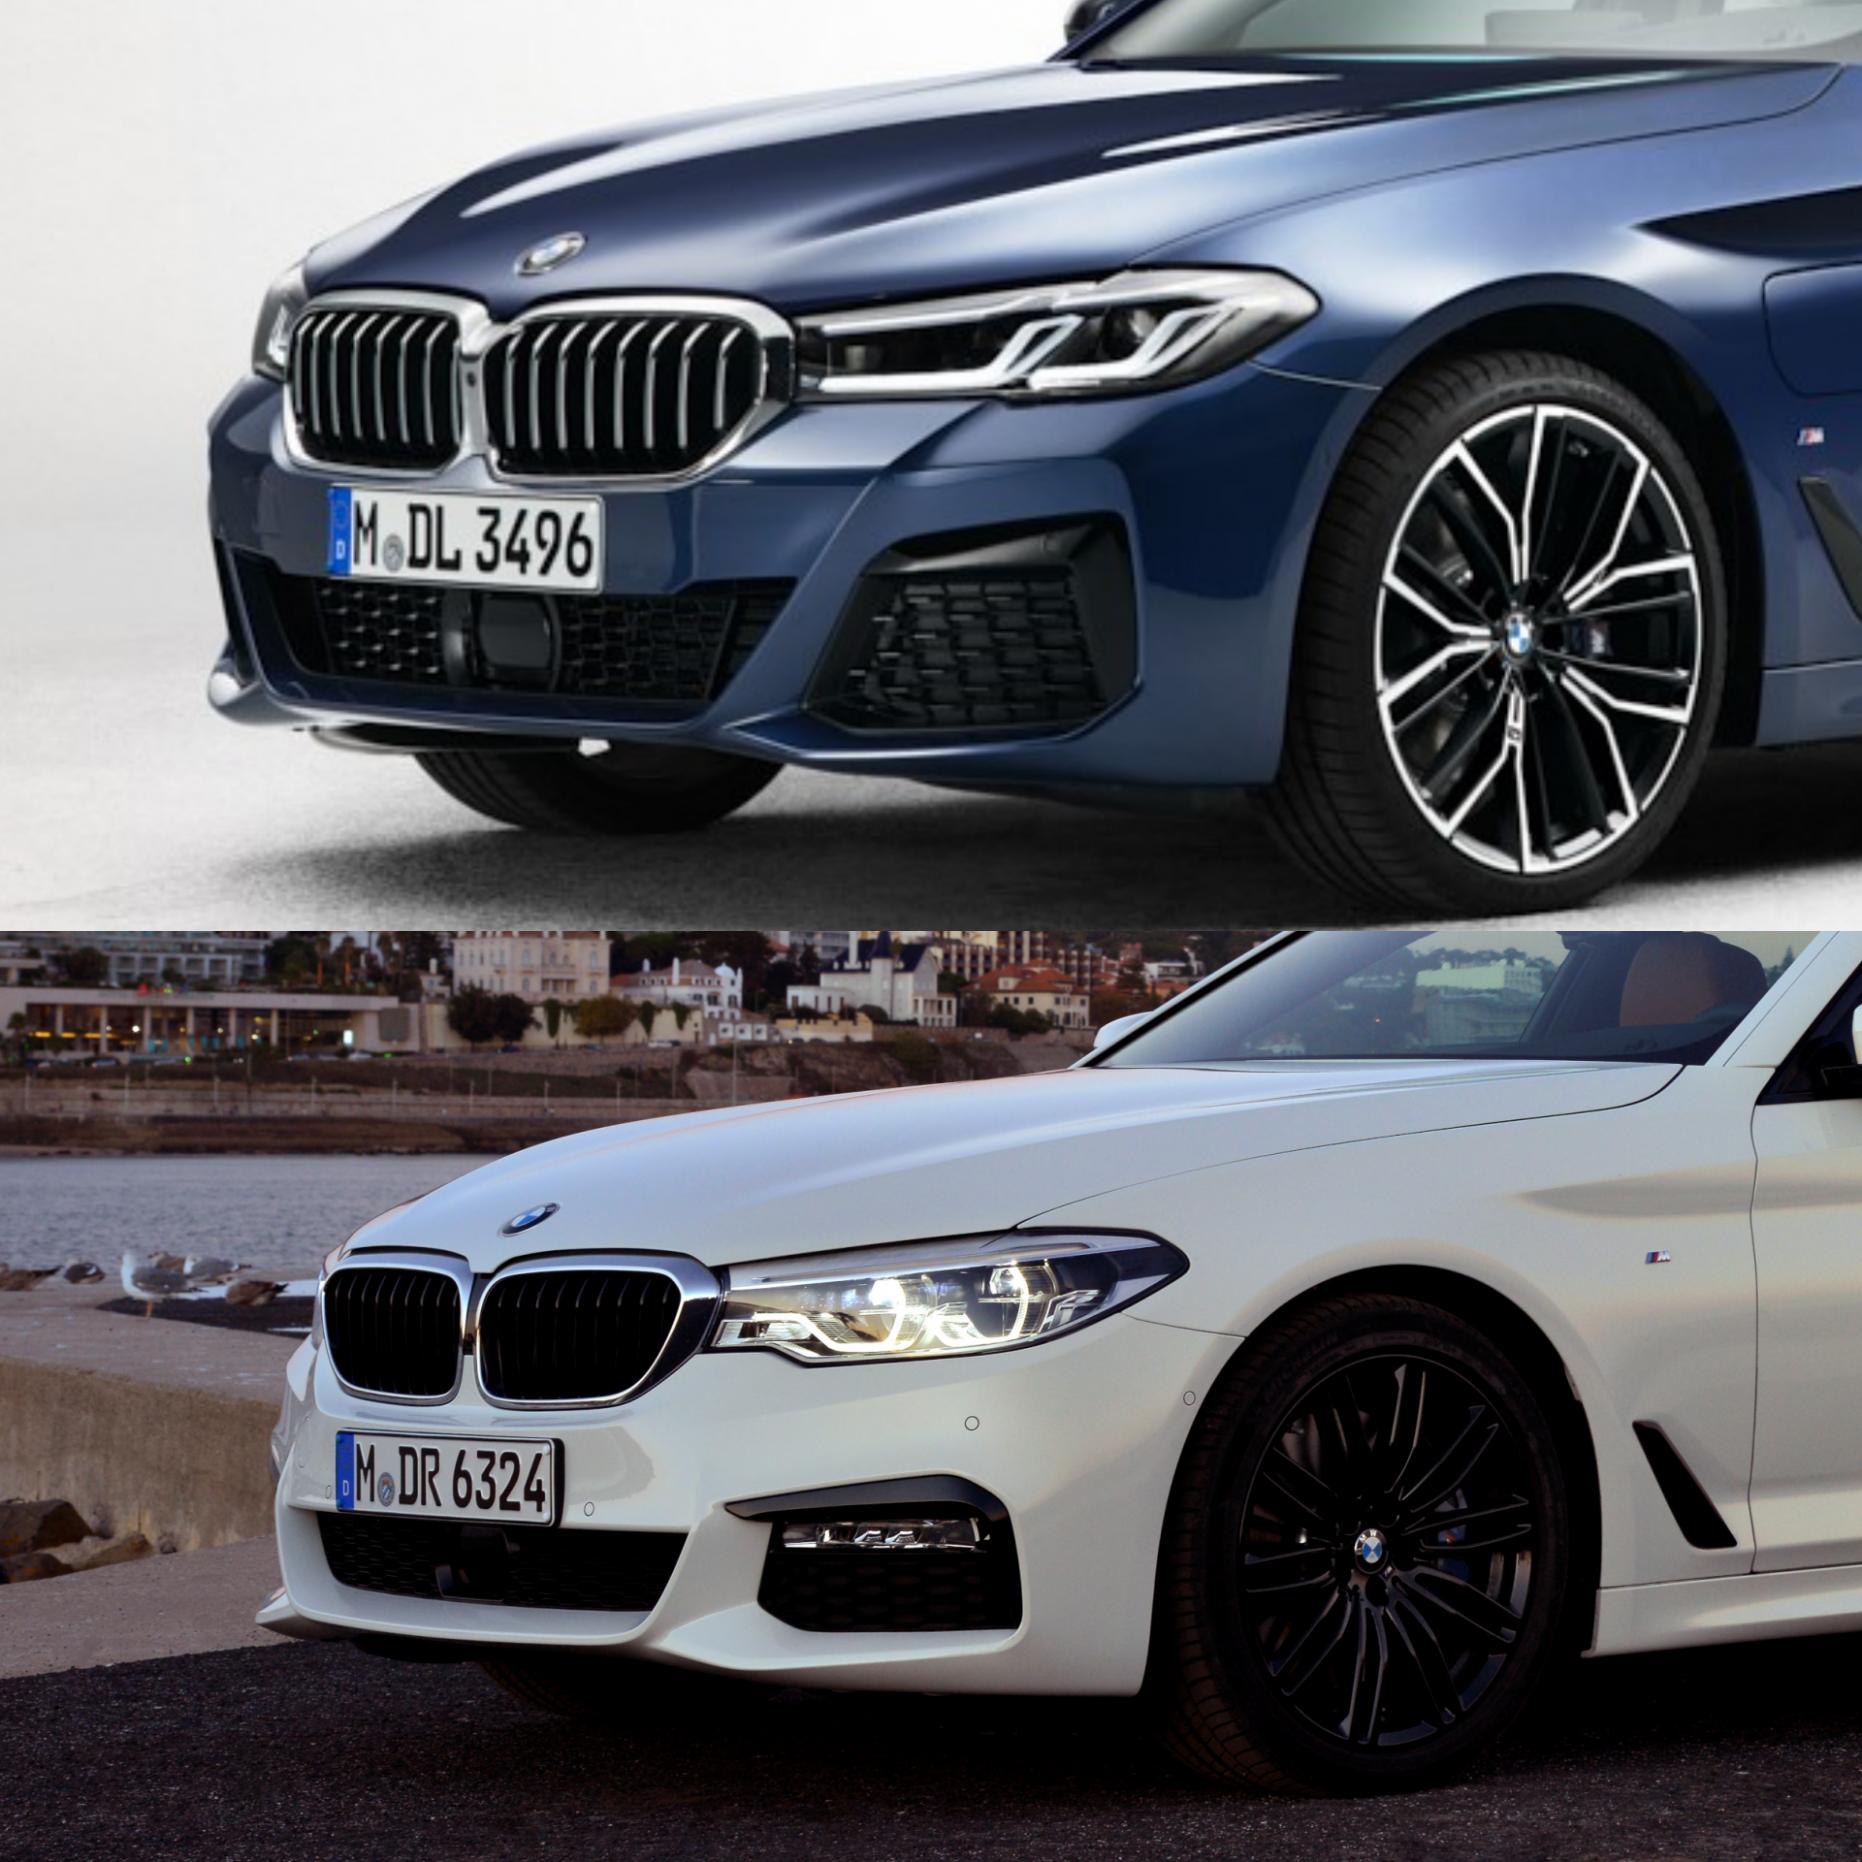 New Concept BMW G30 Lci 2022